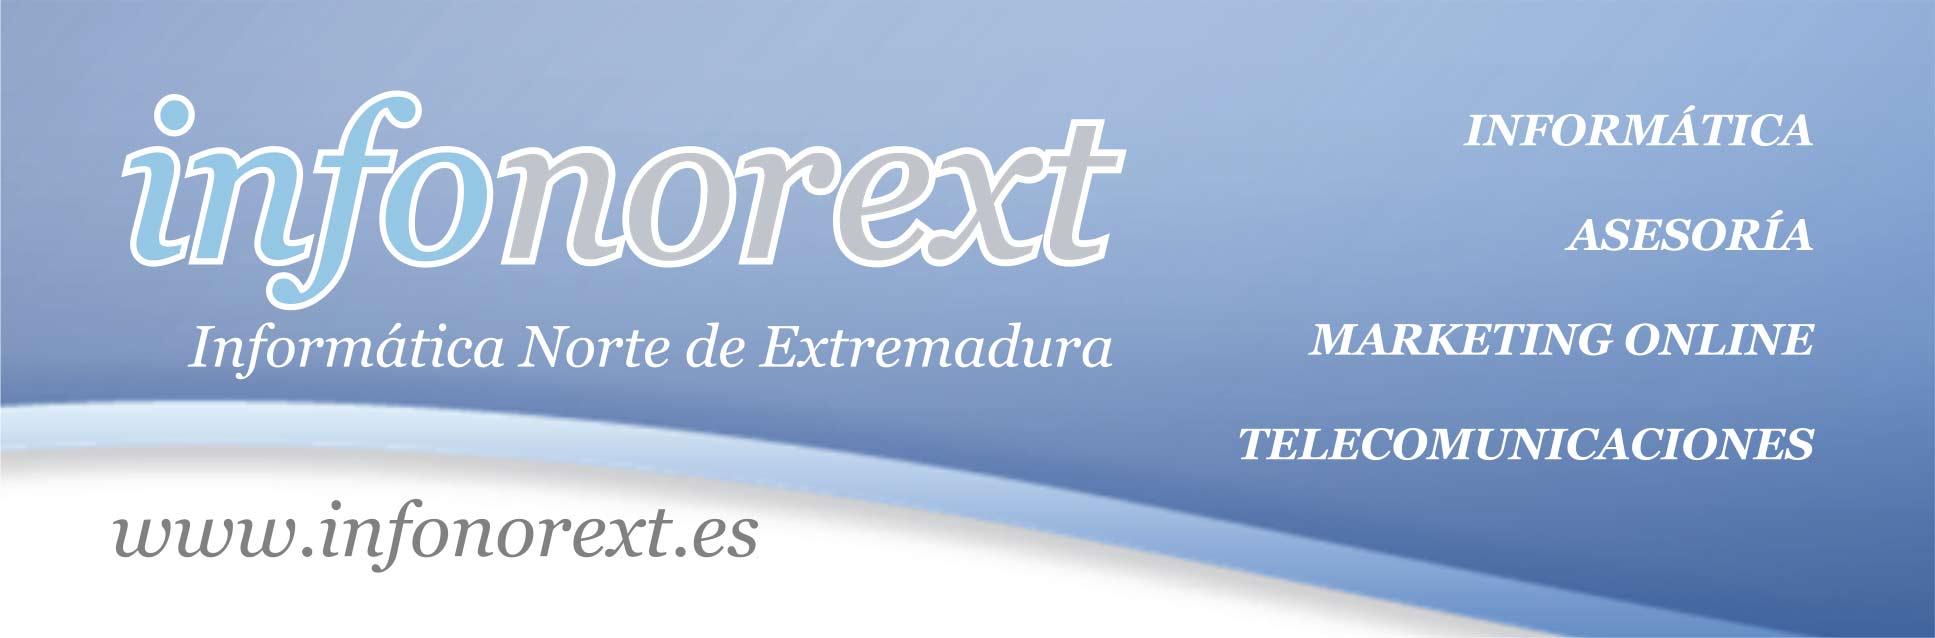 Informática Norte de Extremadura